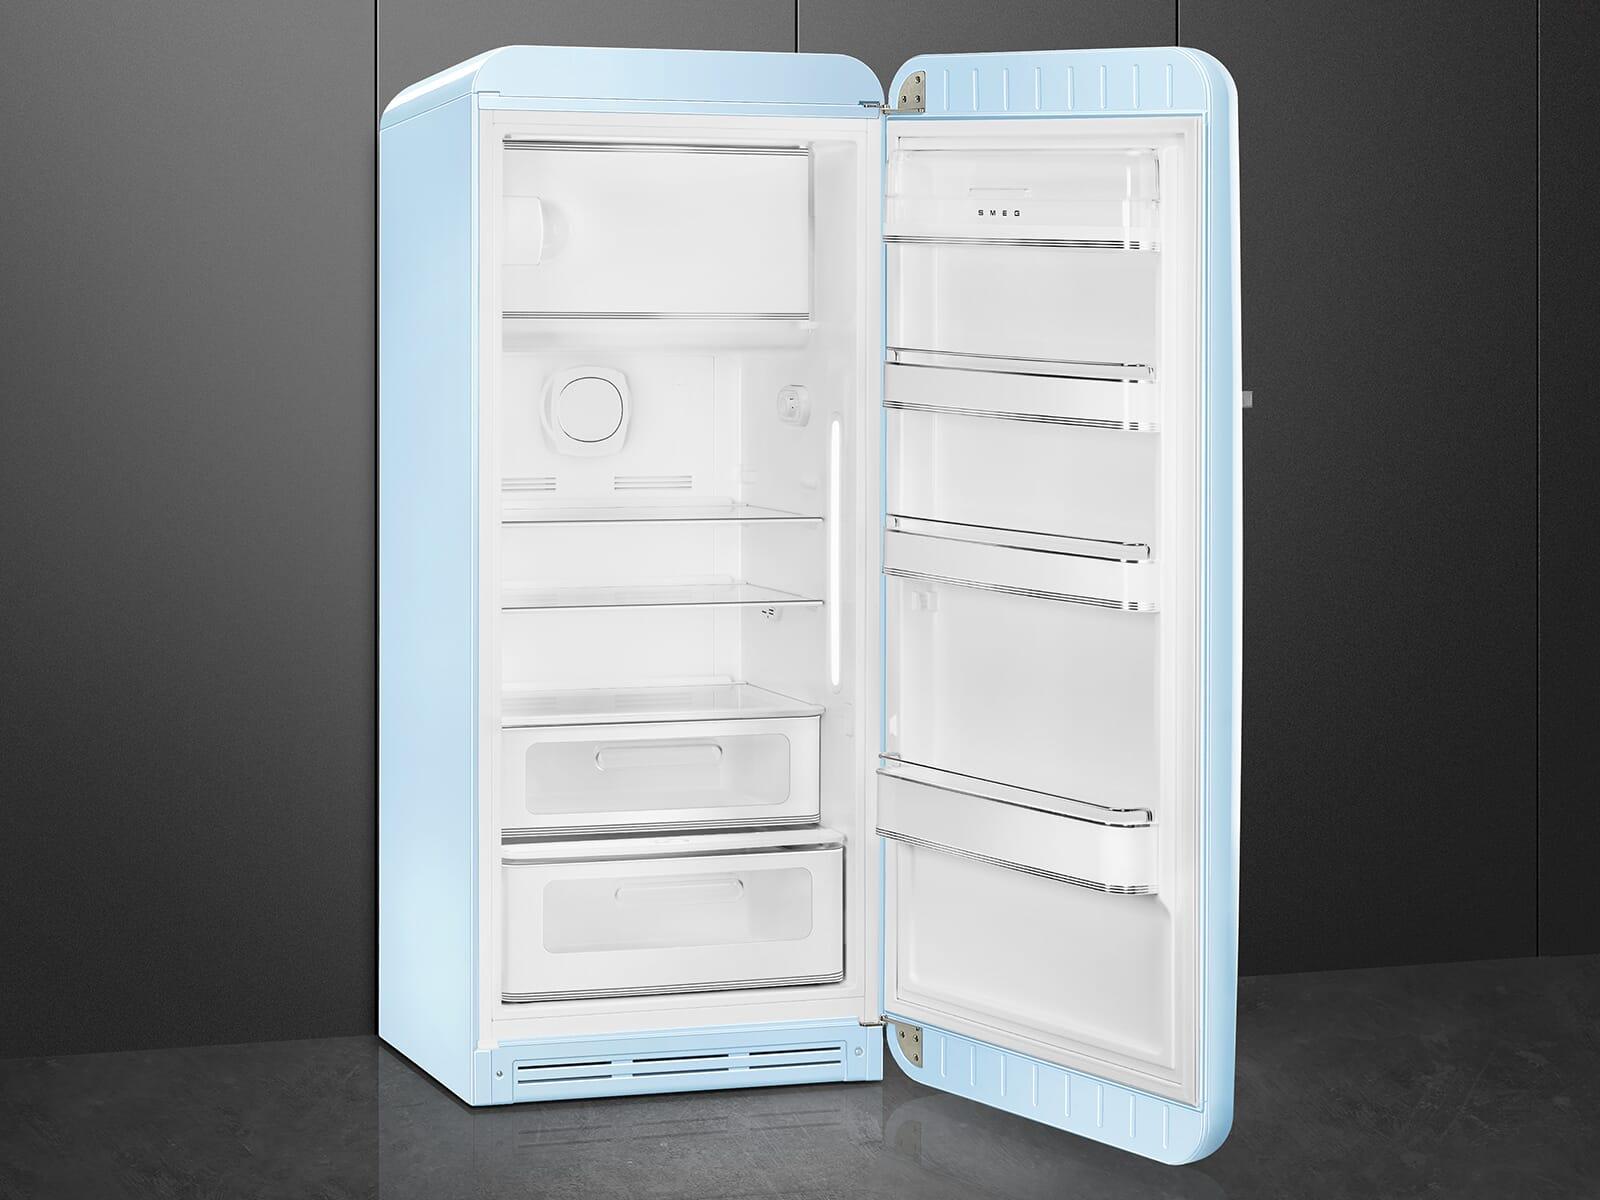 Smeg FAB28RPB3 Standkühlschrank Pastellblau